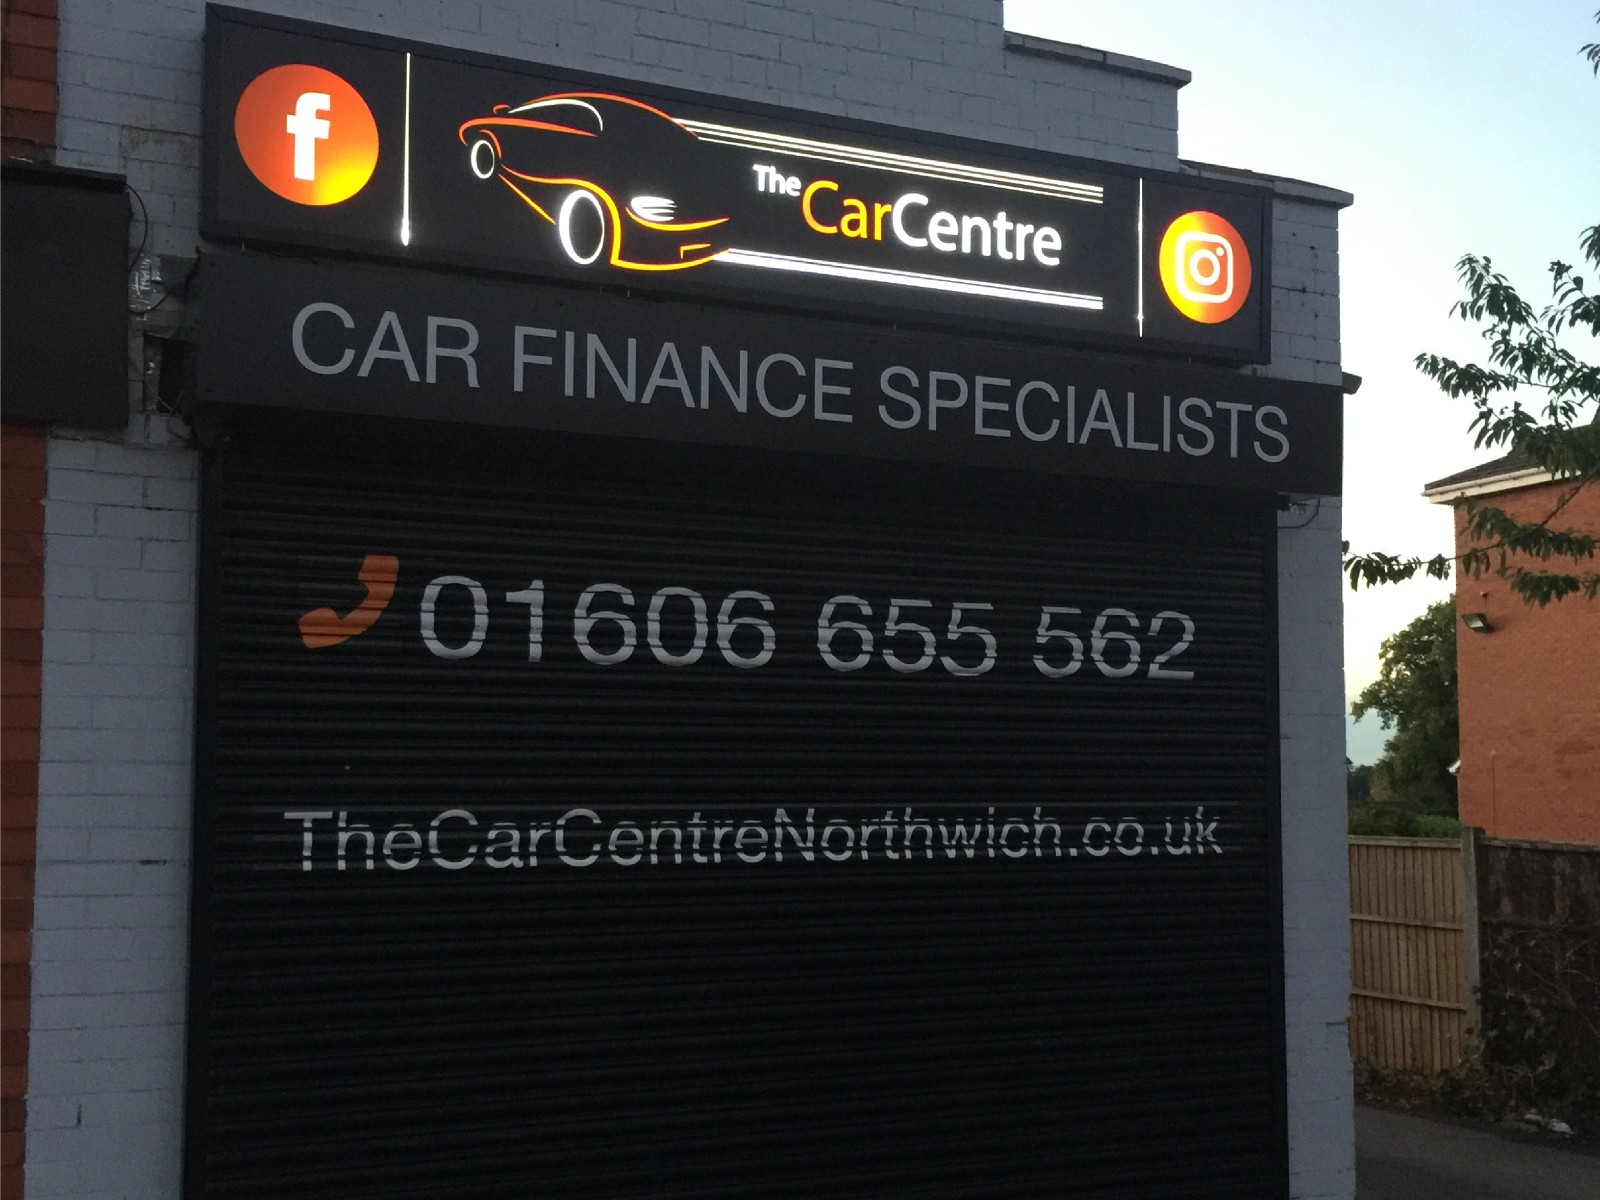 The-Car-Centre-Illuminated-Signage